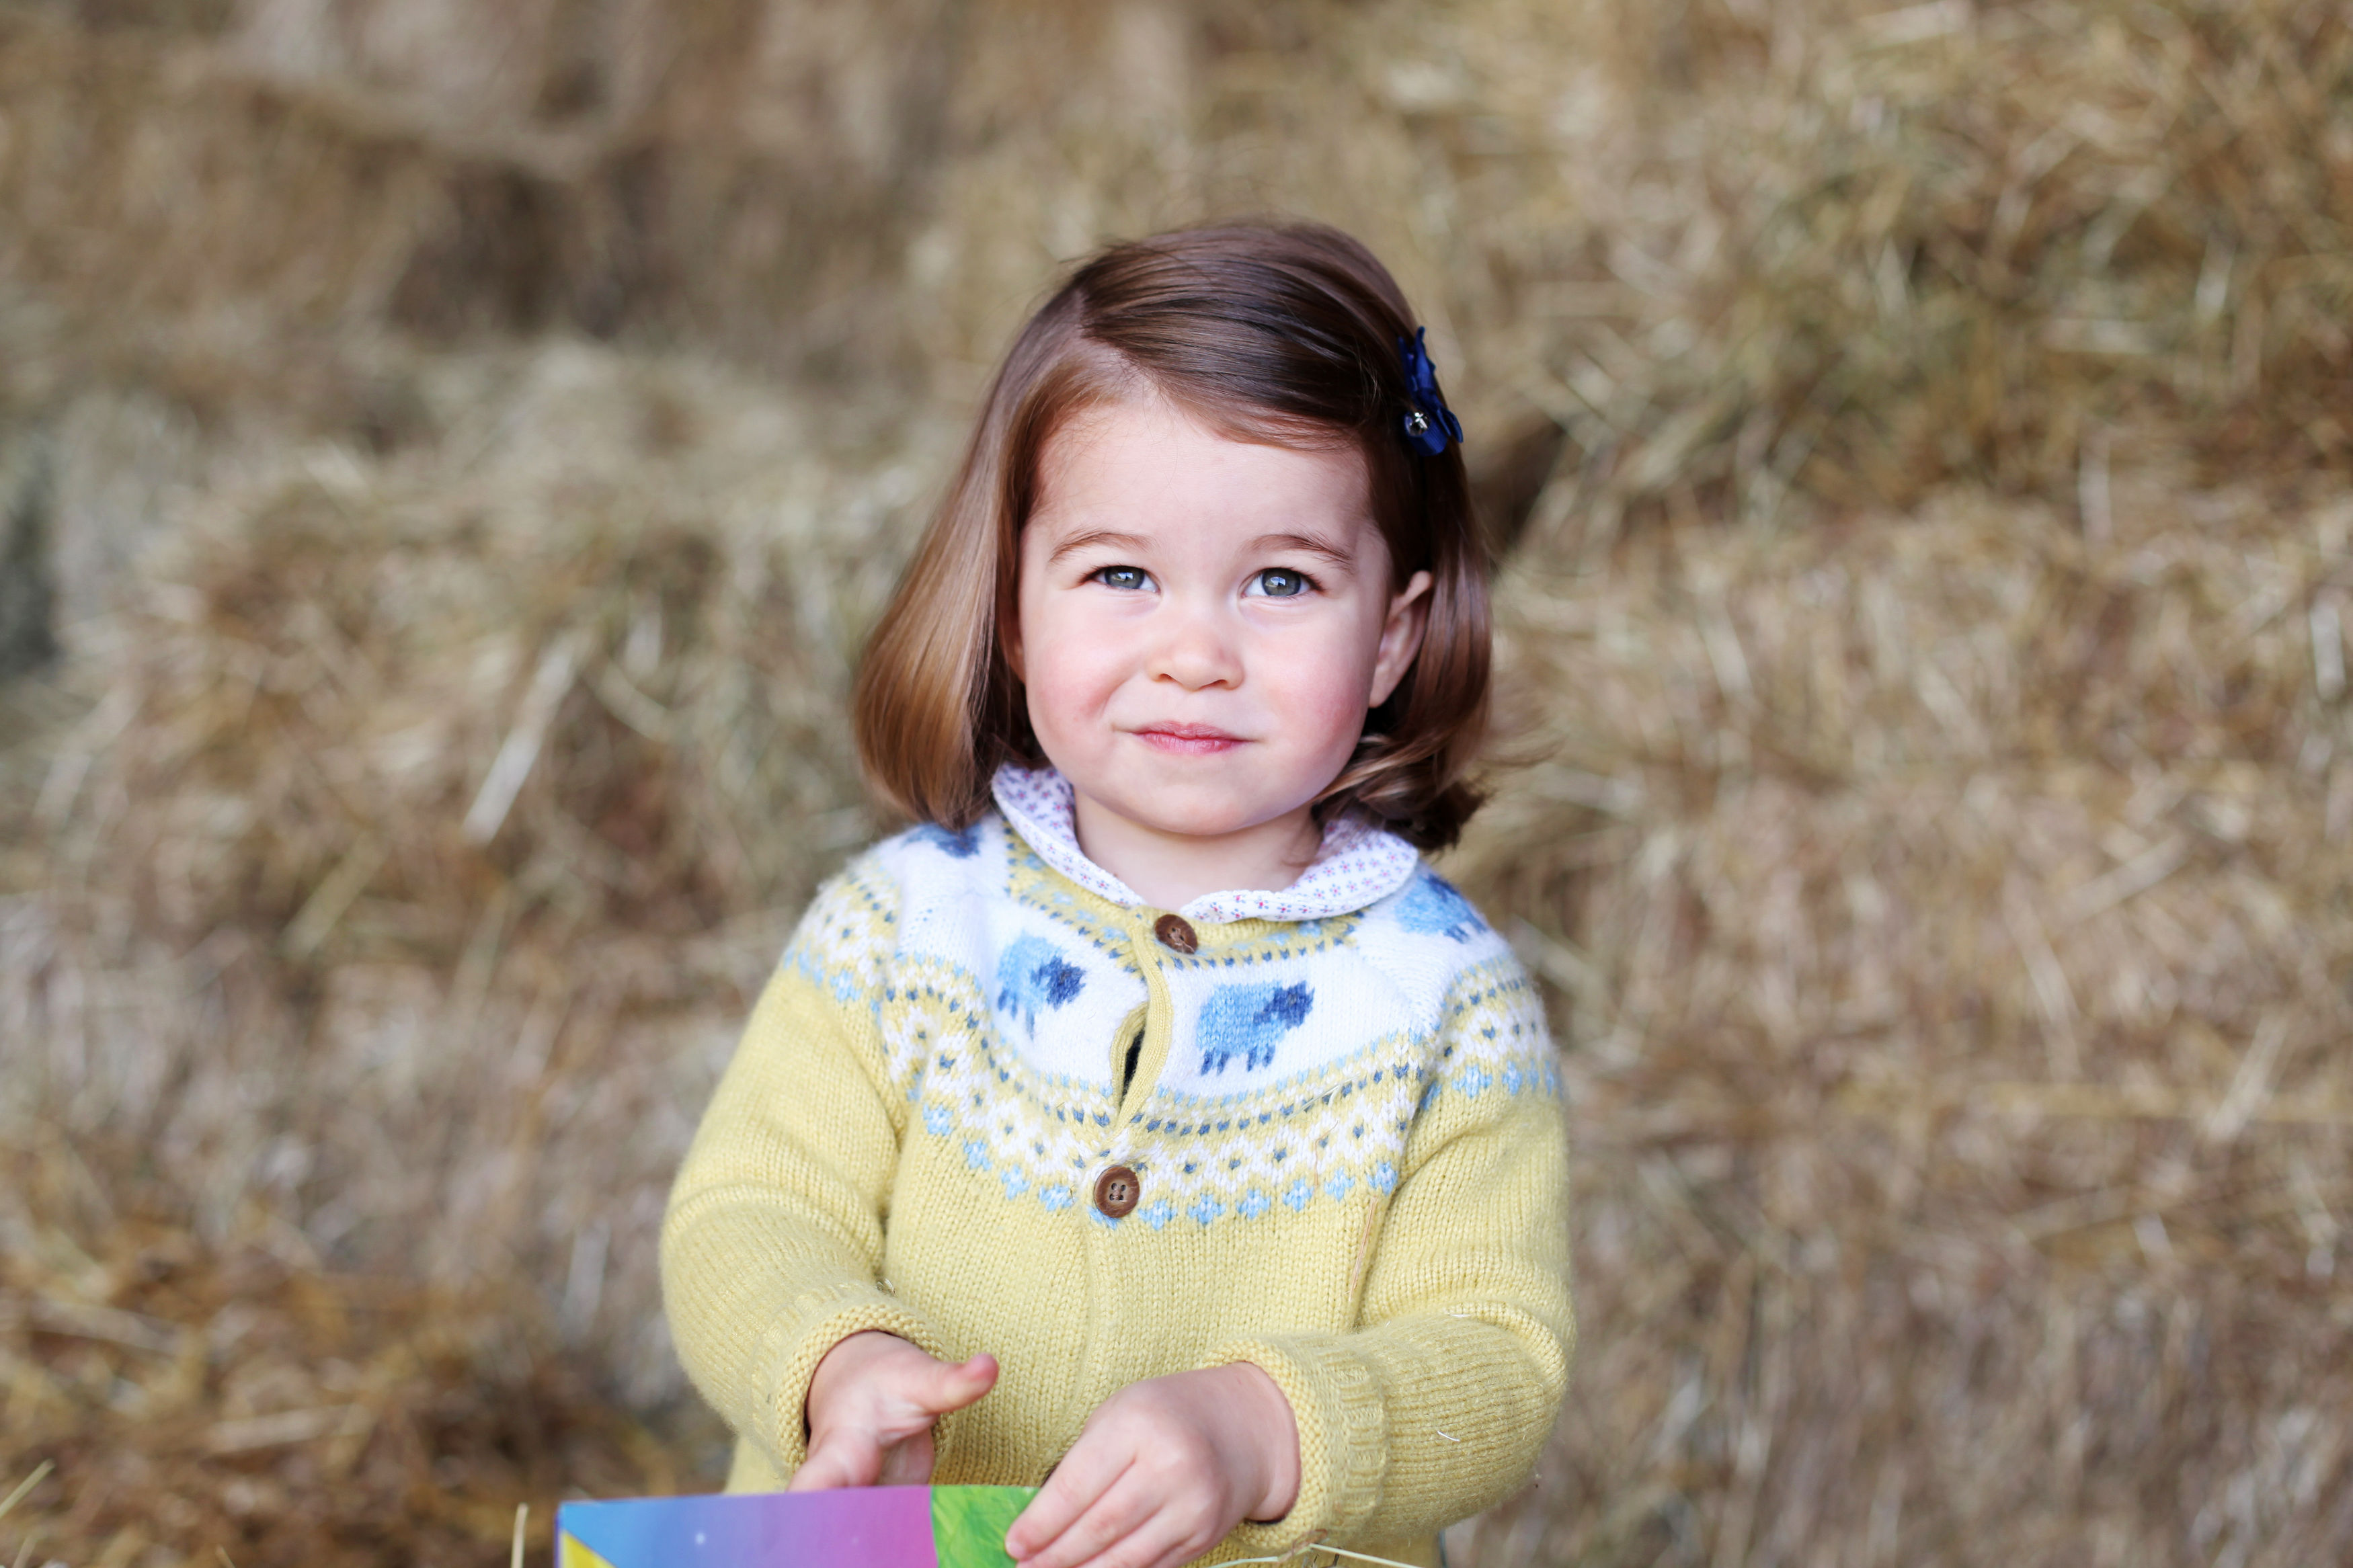 Princess Charlotte adorable moments